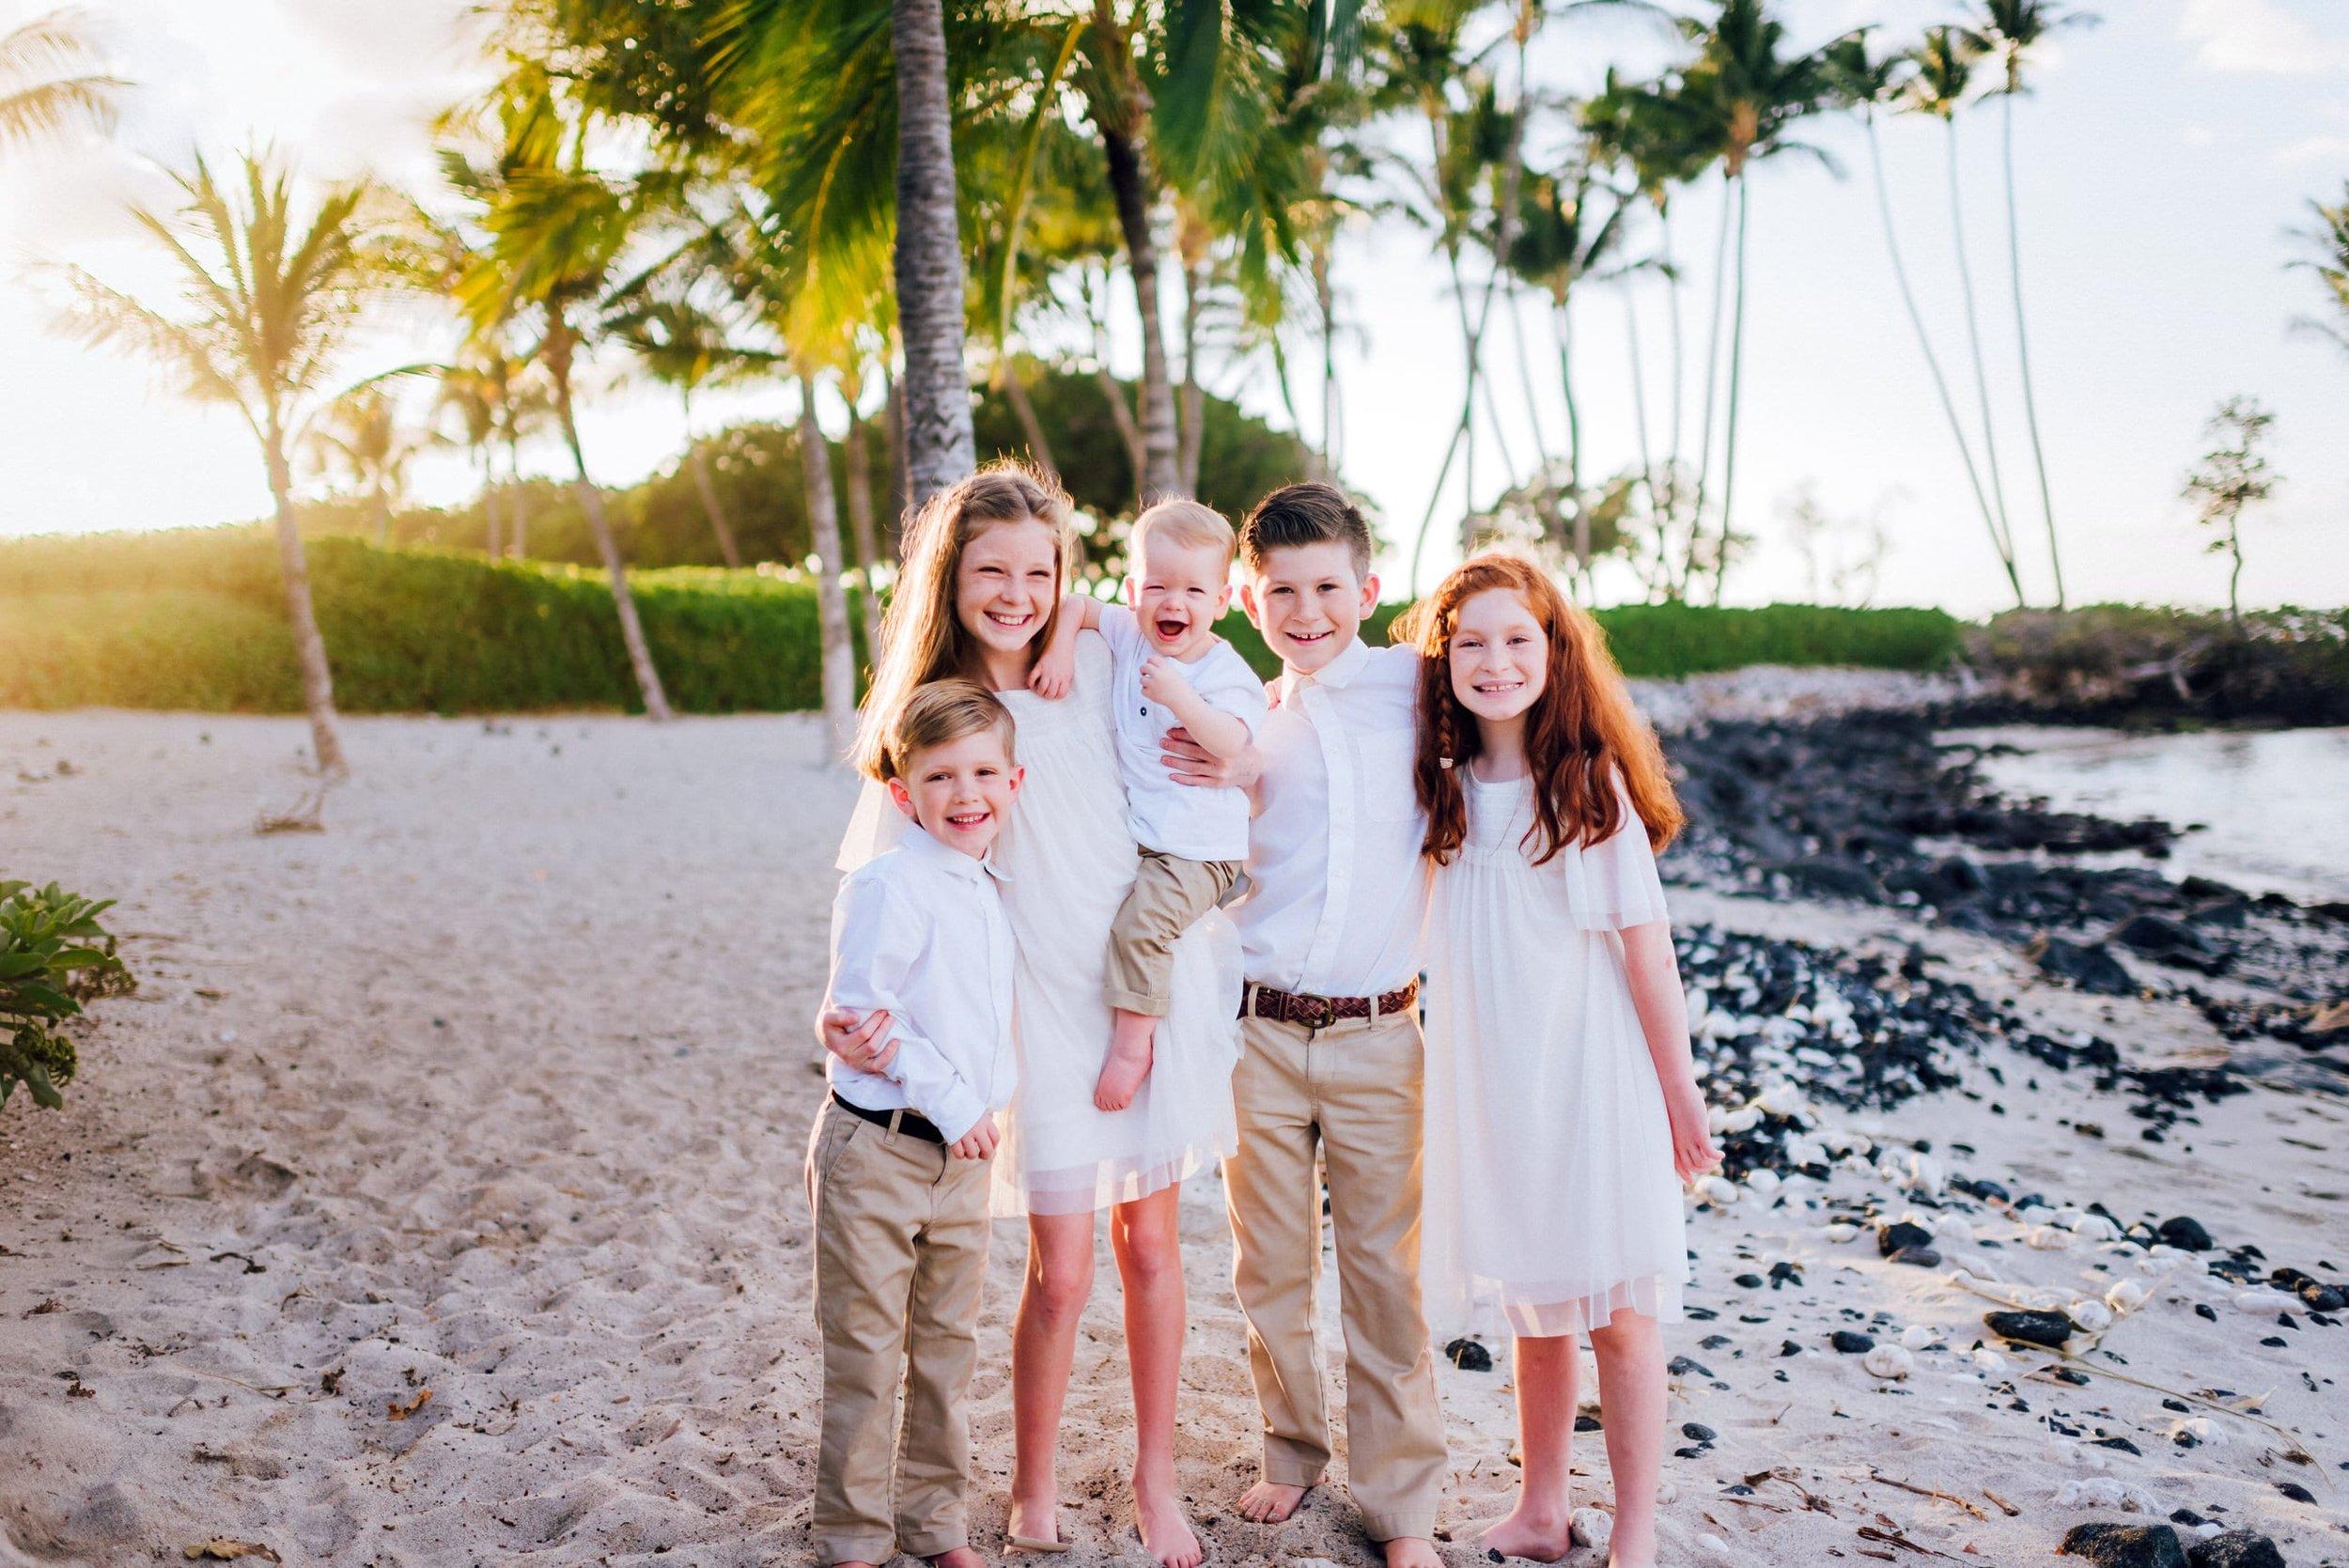 Hawaii-Family-Photographer-Waikoloa-Fairmont-Hualalai-Mauna-Kea-15.jpg